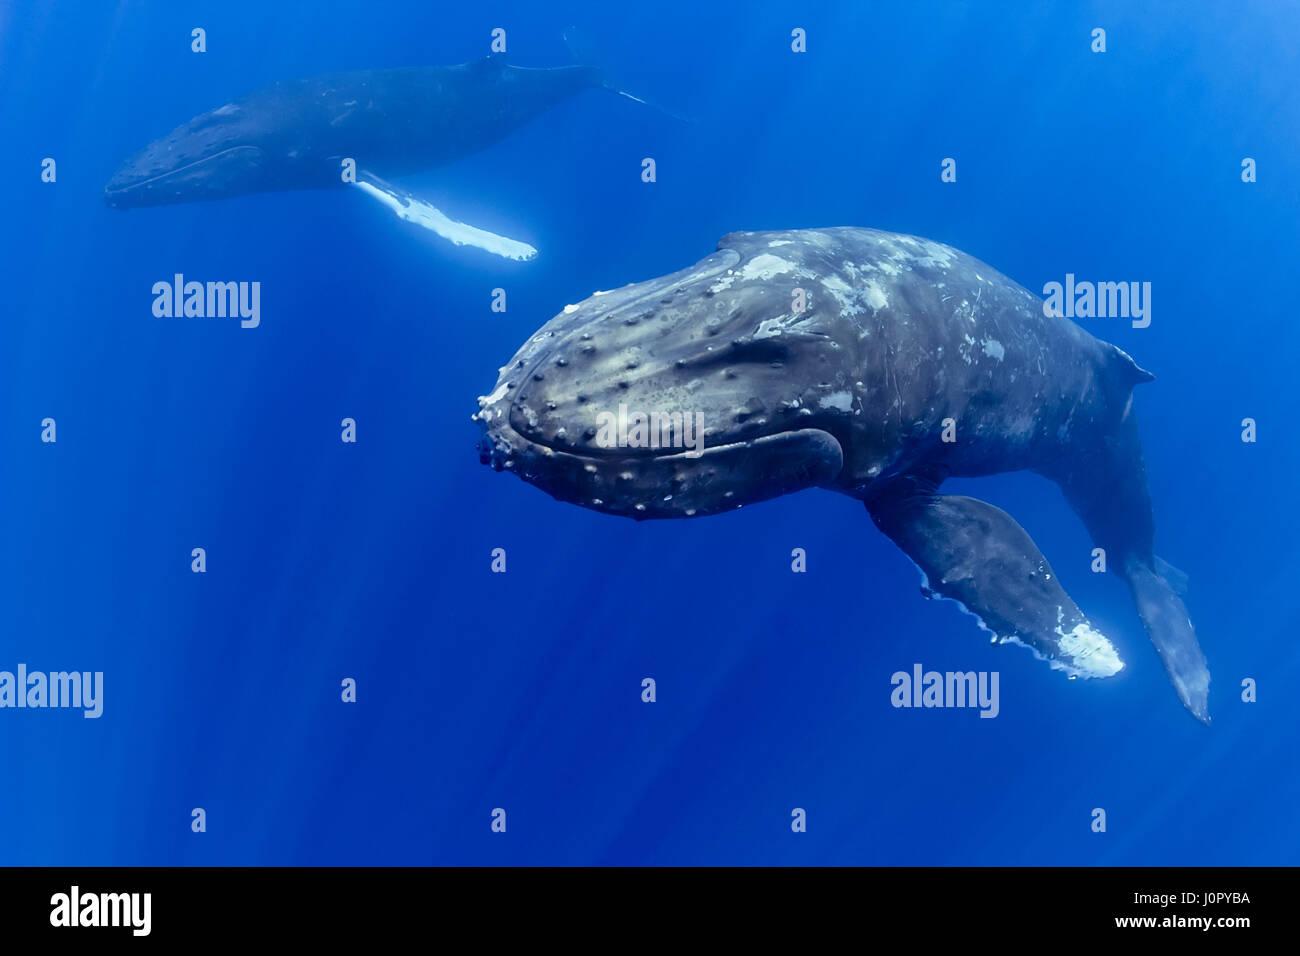 Humpback Whale, Courtship Behavior, Megaptera novaeangliae, Hawaii, USA Stock Photo